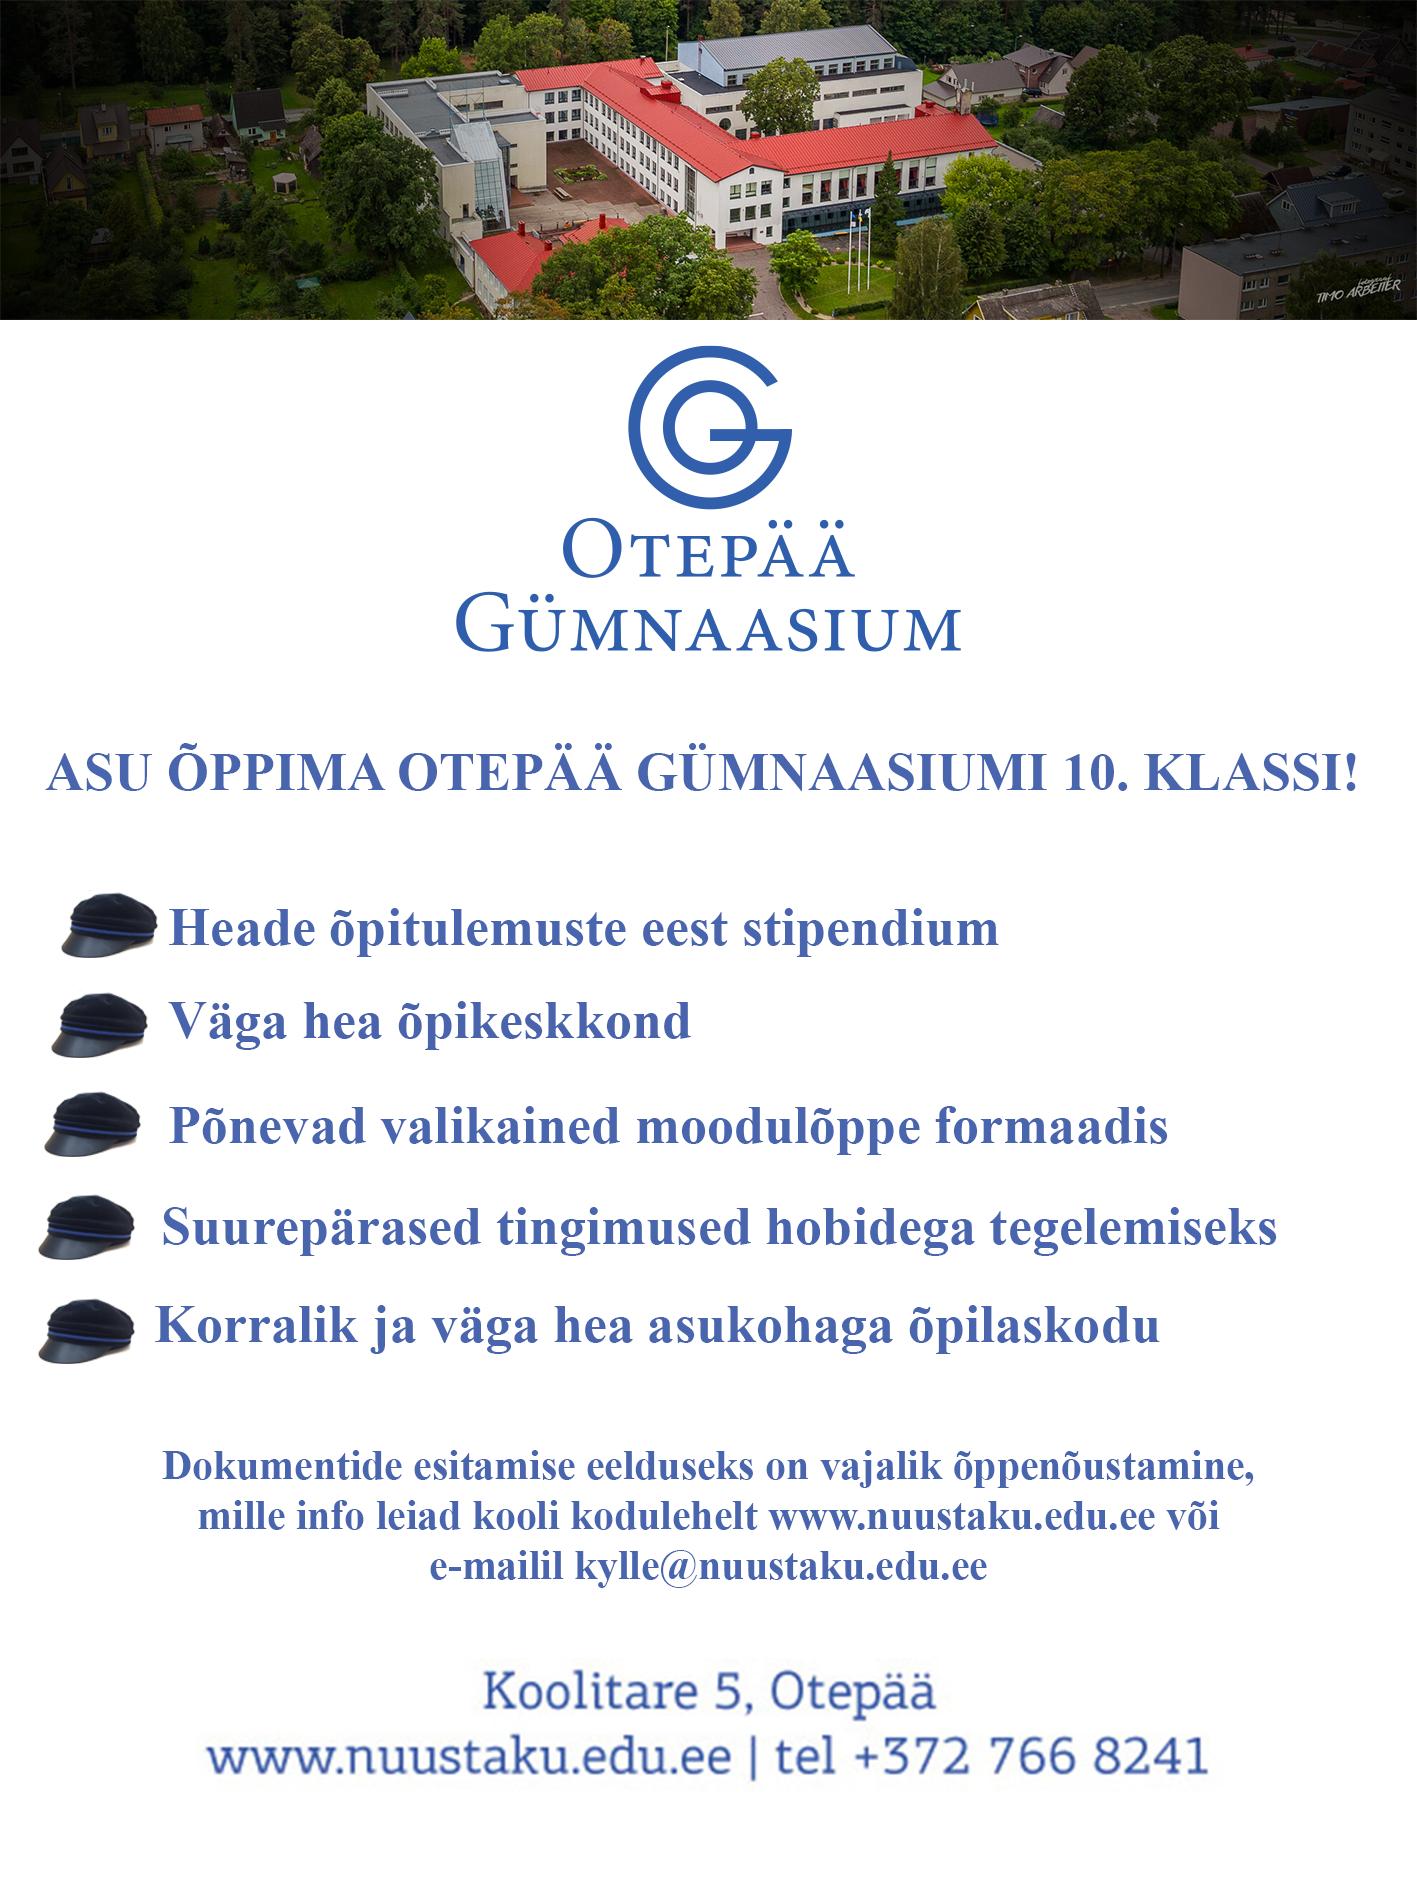 Otepää Gümnaasium